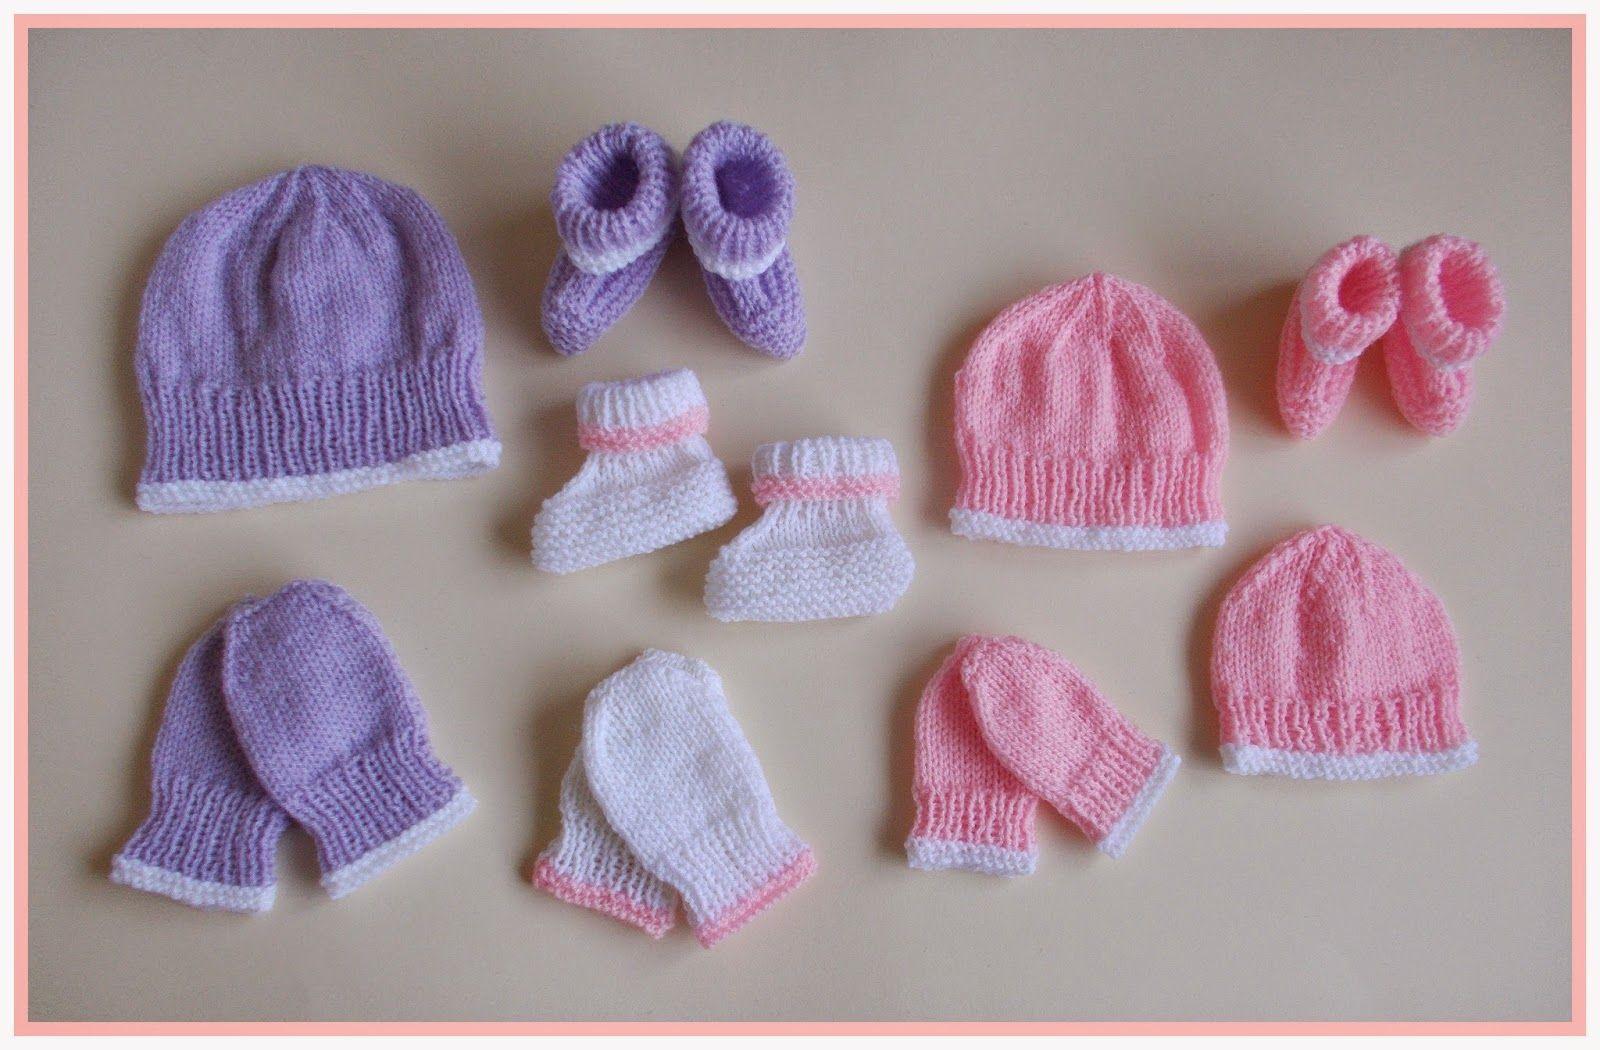 Premature newborn baby hat mittens bootees mariannas lazy premature newborn baby hat mittens bootees mariannas lazy daisy days bankloansurffo Gallery